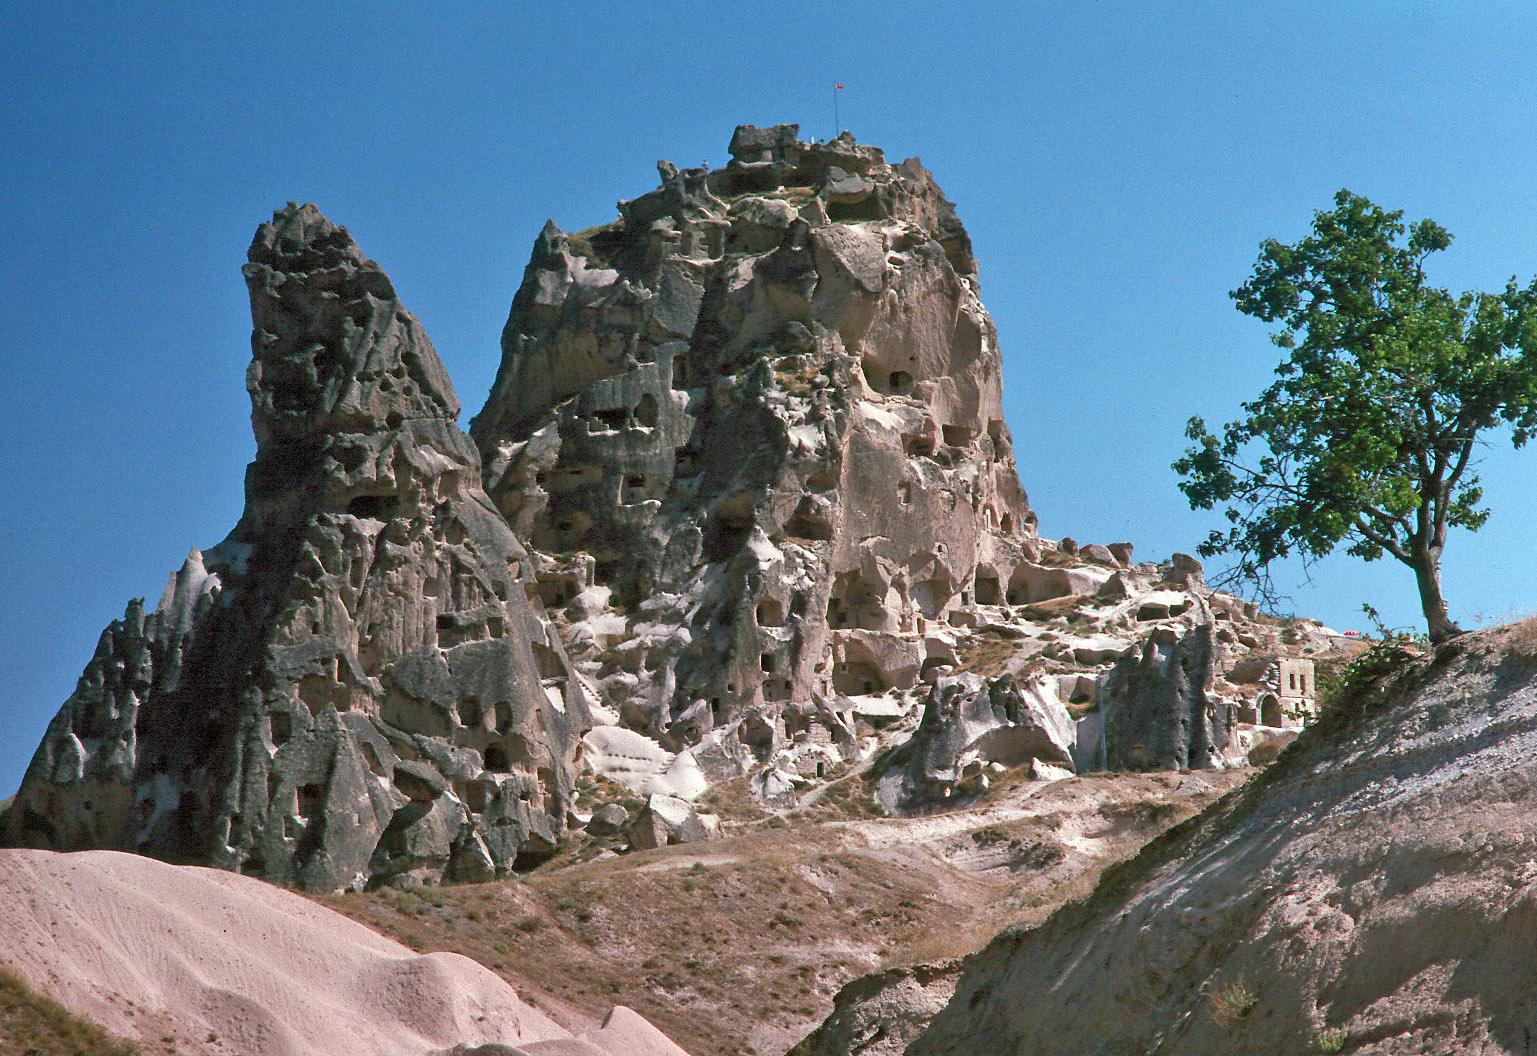 File:Göreme Felsenwohnungen.jpg - Wikimedia Commons